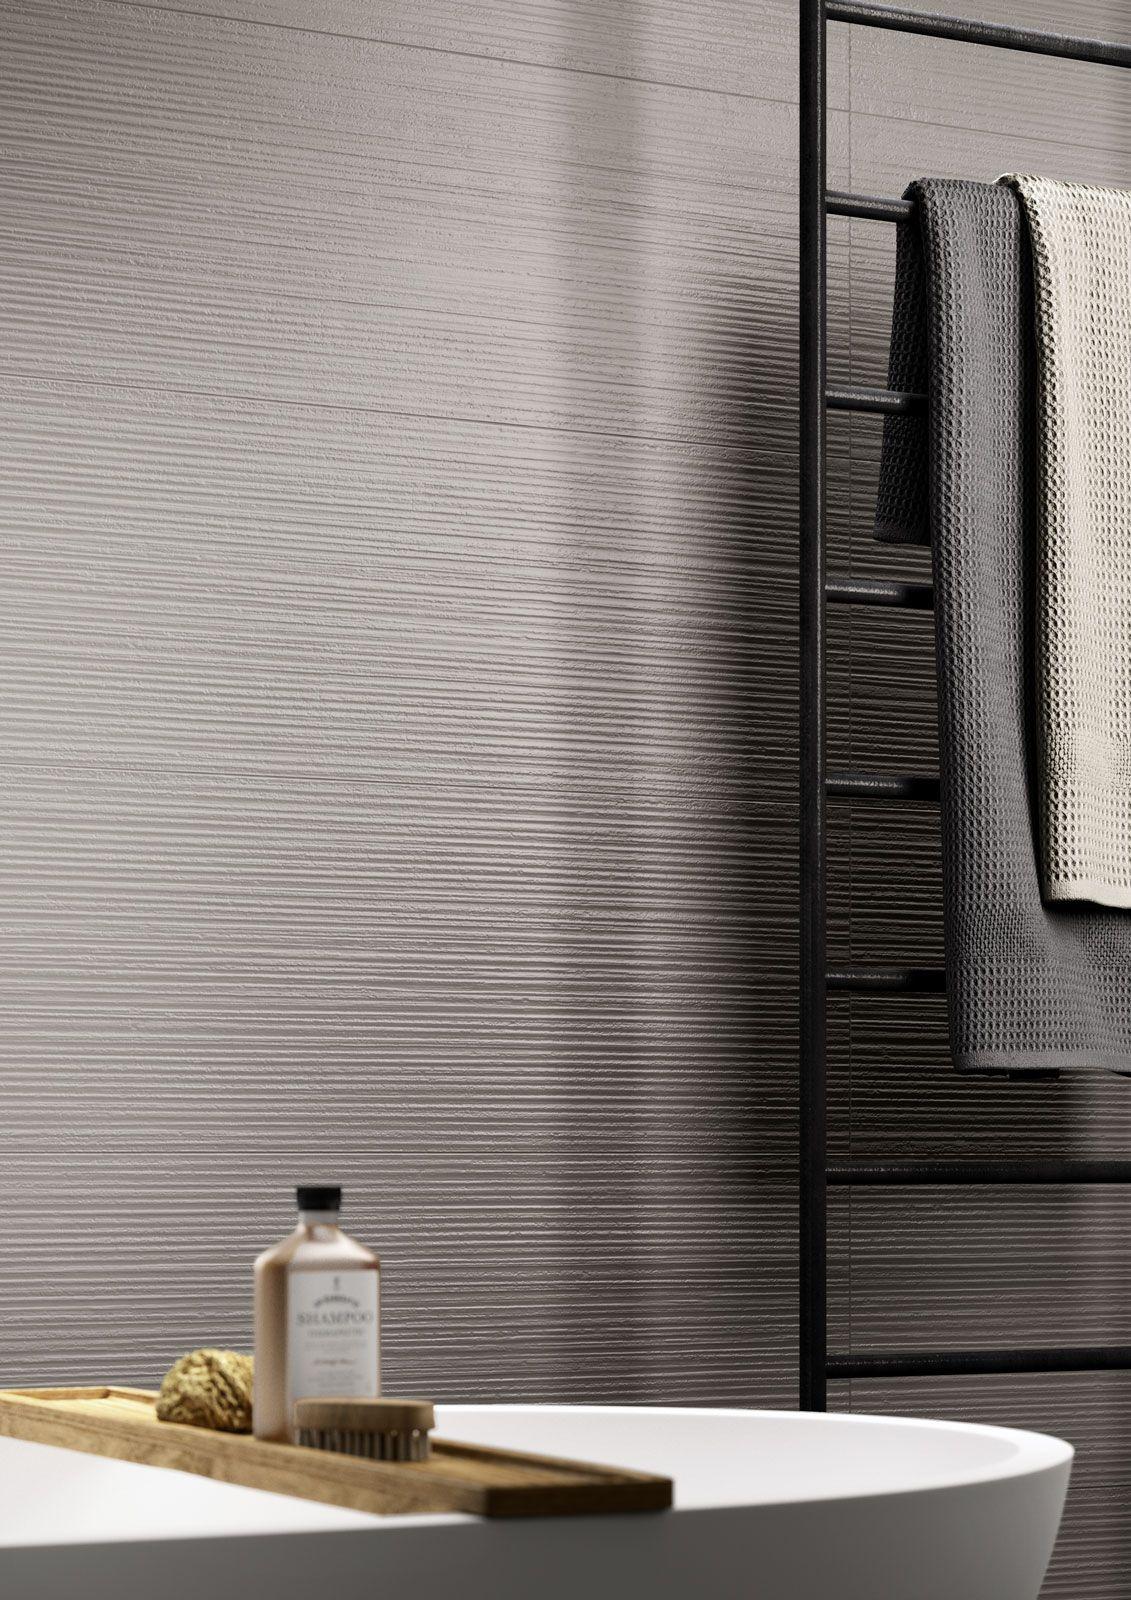 materika carrellage en c ramique marazzi 6947 deco salle de bain pinterest salle de bain. Black Bedroom Furniture Sets. Home Design Ideas